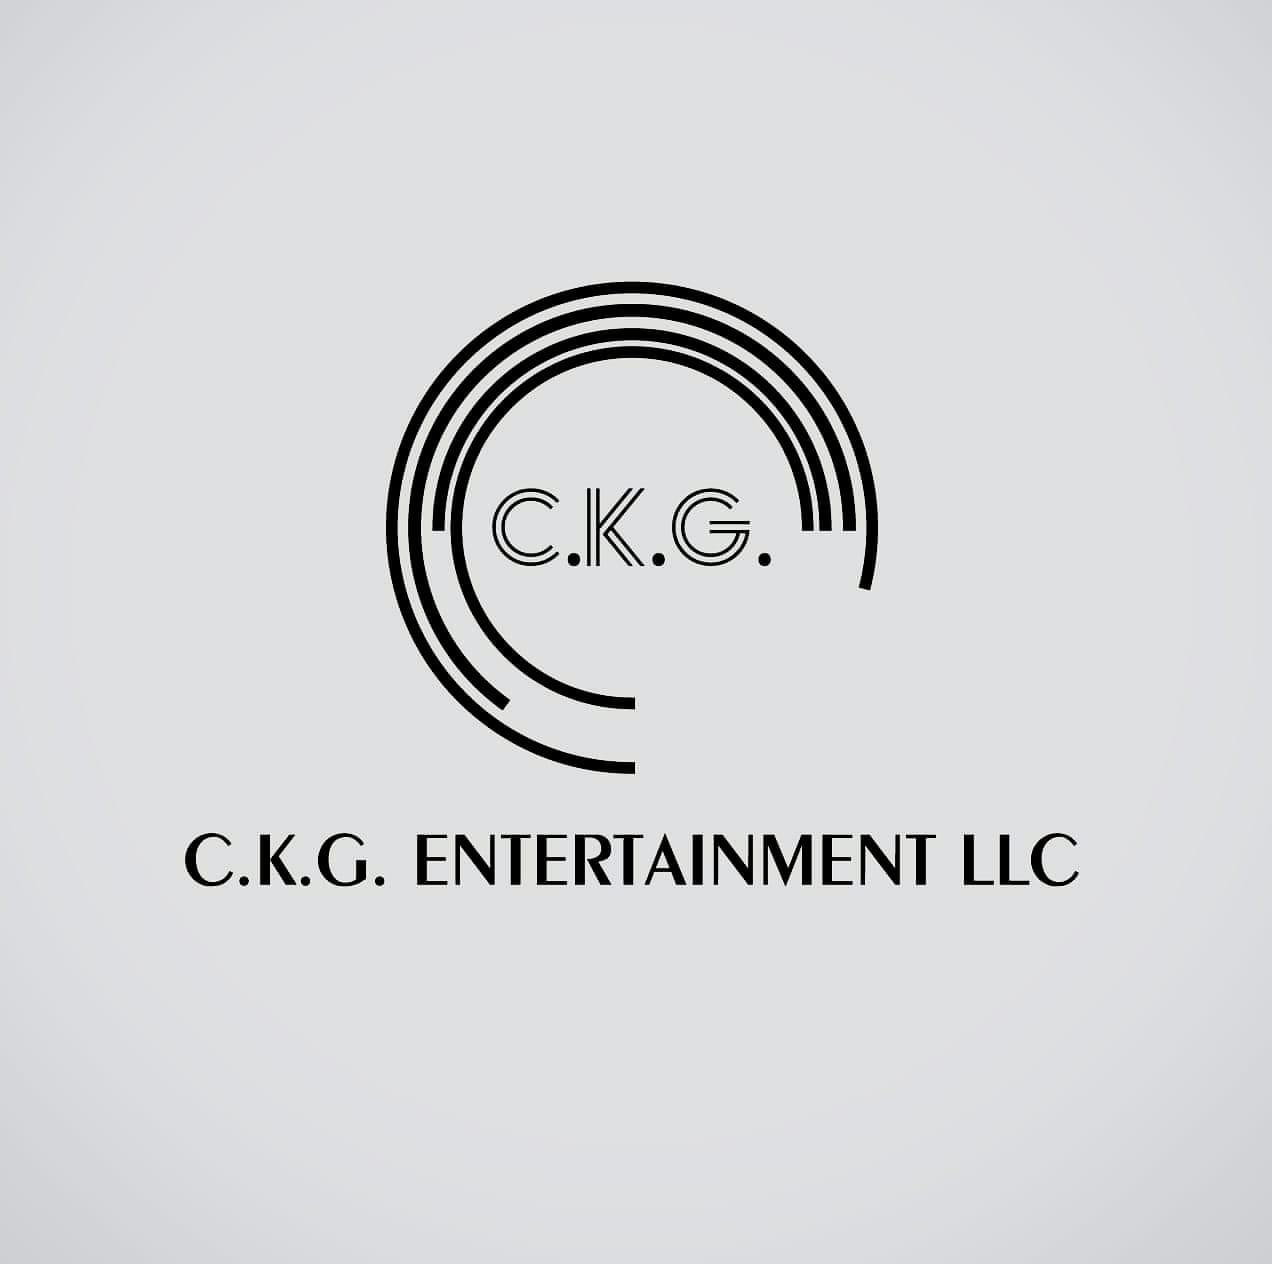 C.K.G. Entertainment. LLC